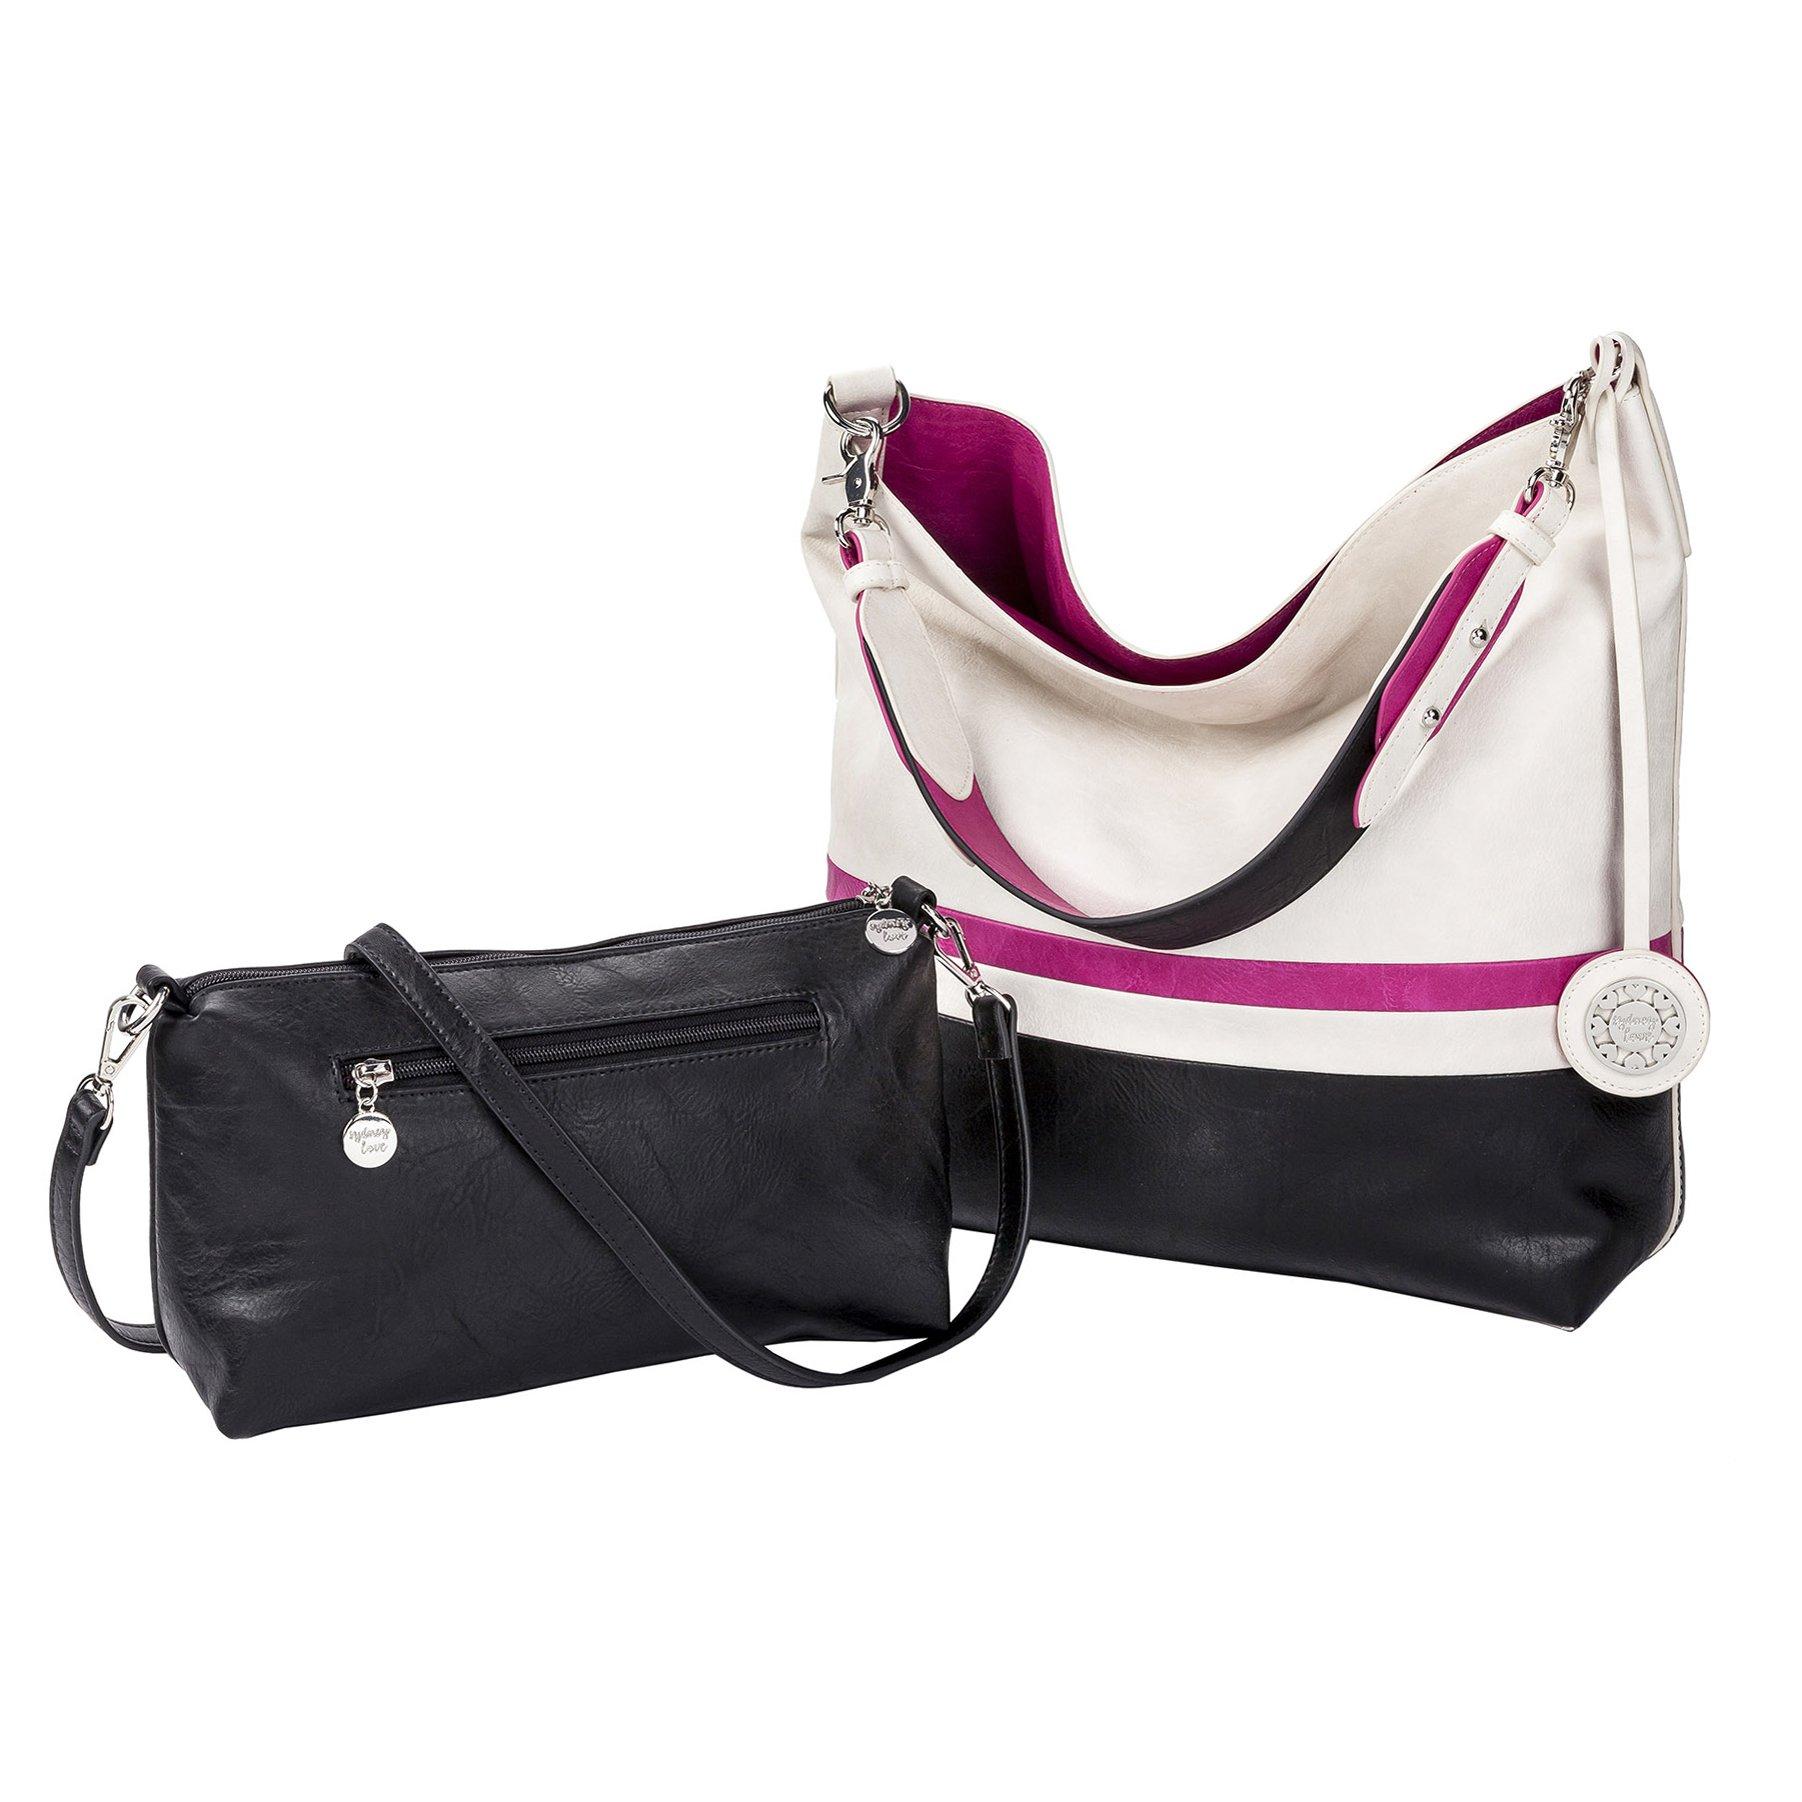 Sydney Love Bright Colorblocked Reversible Hobo & Crossbody Bag Set, White/Fuchsia/Black